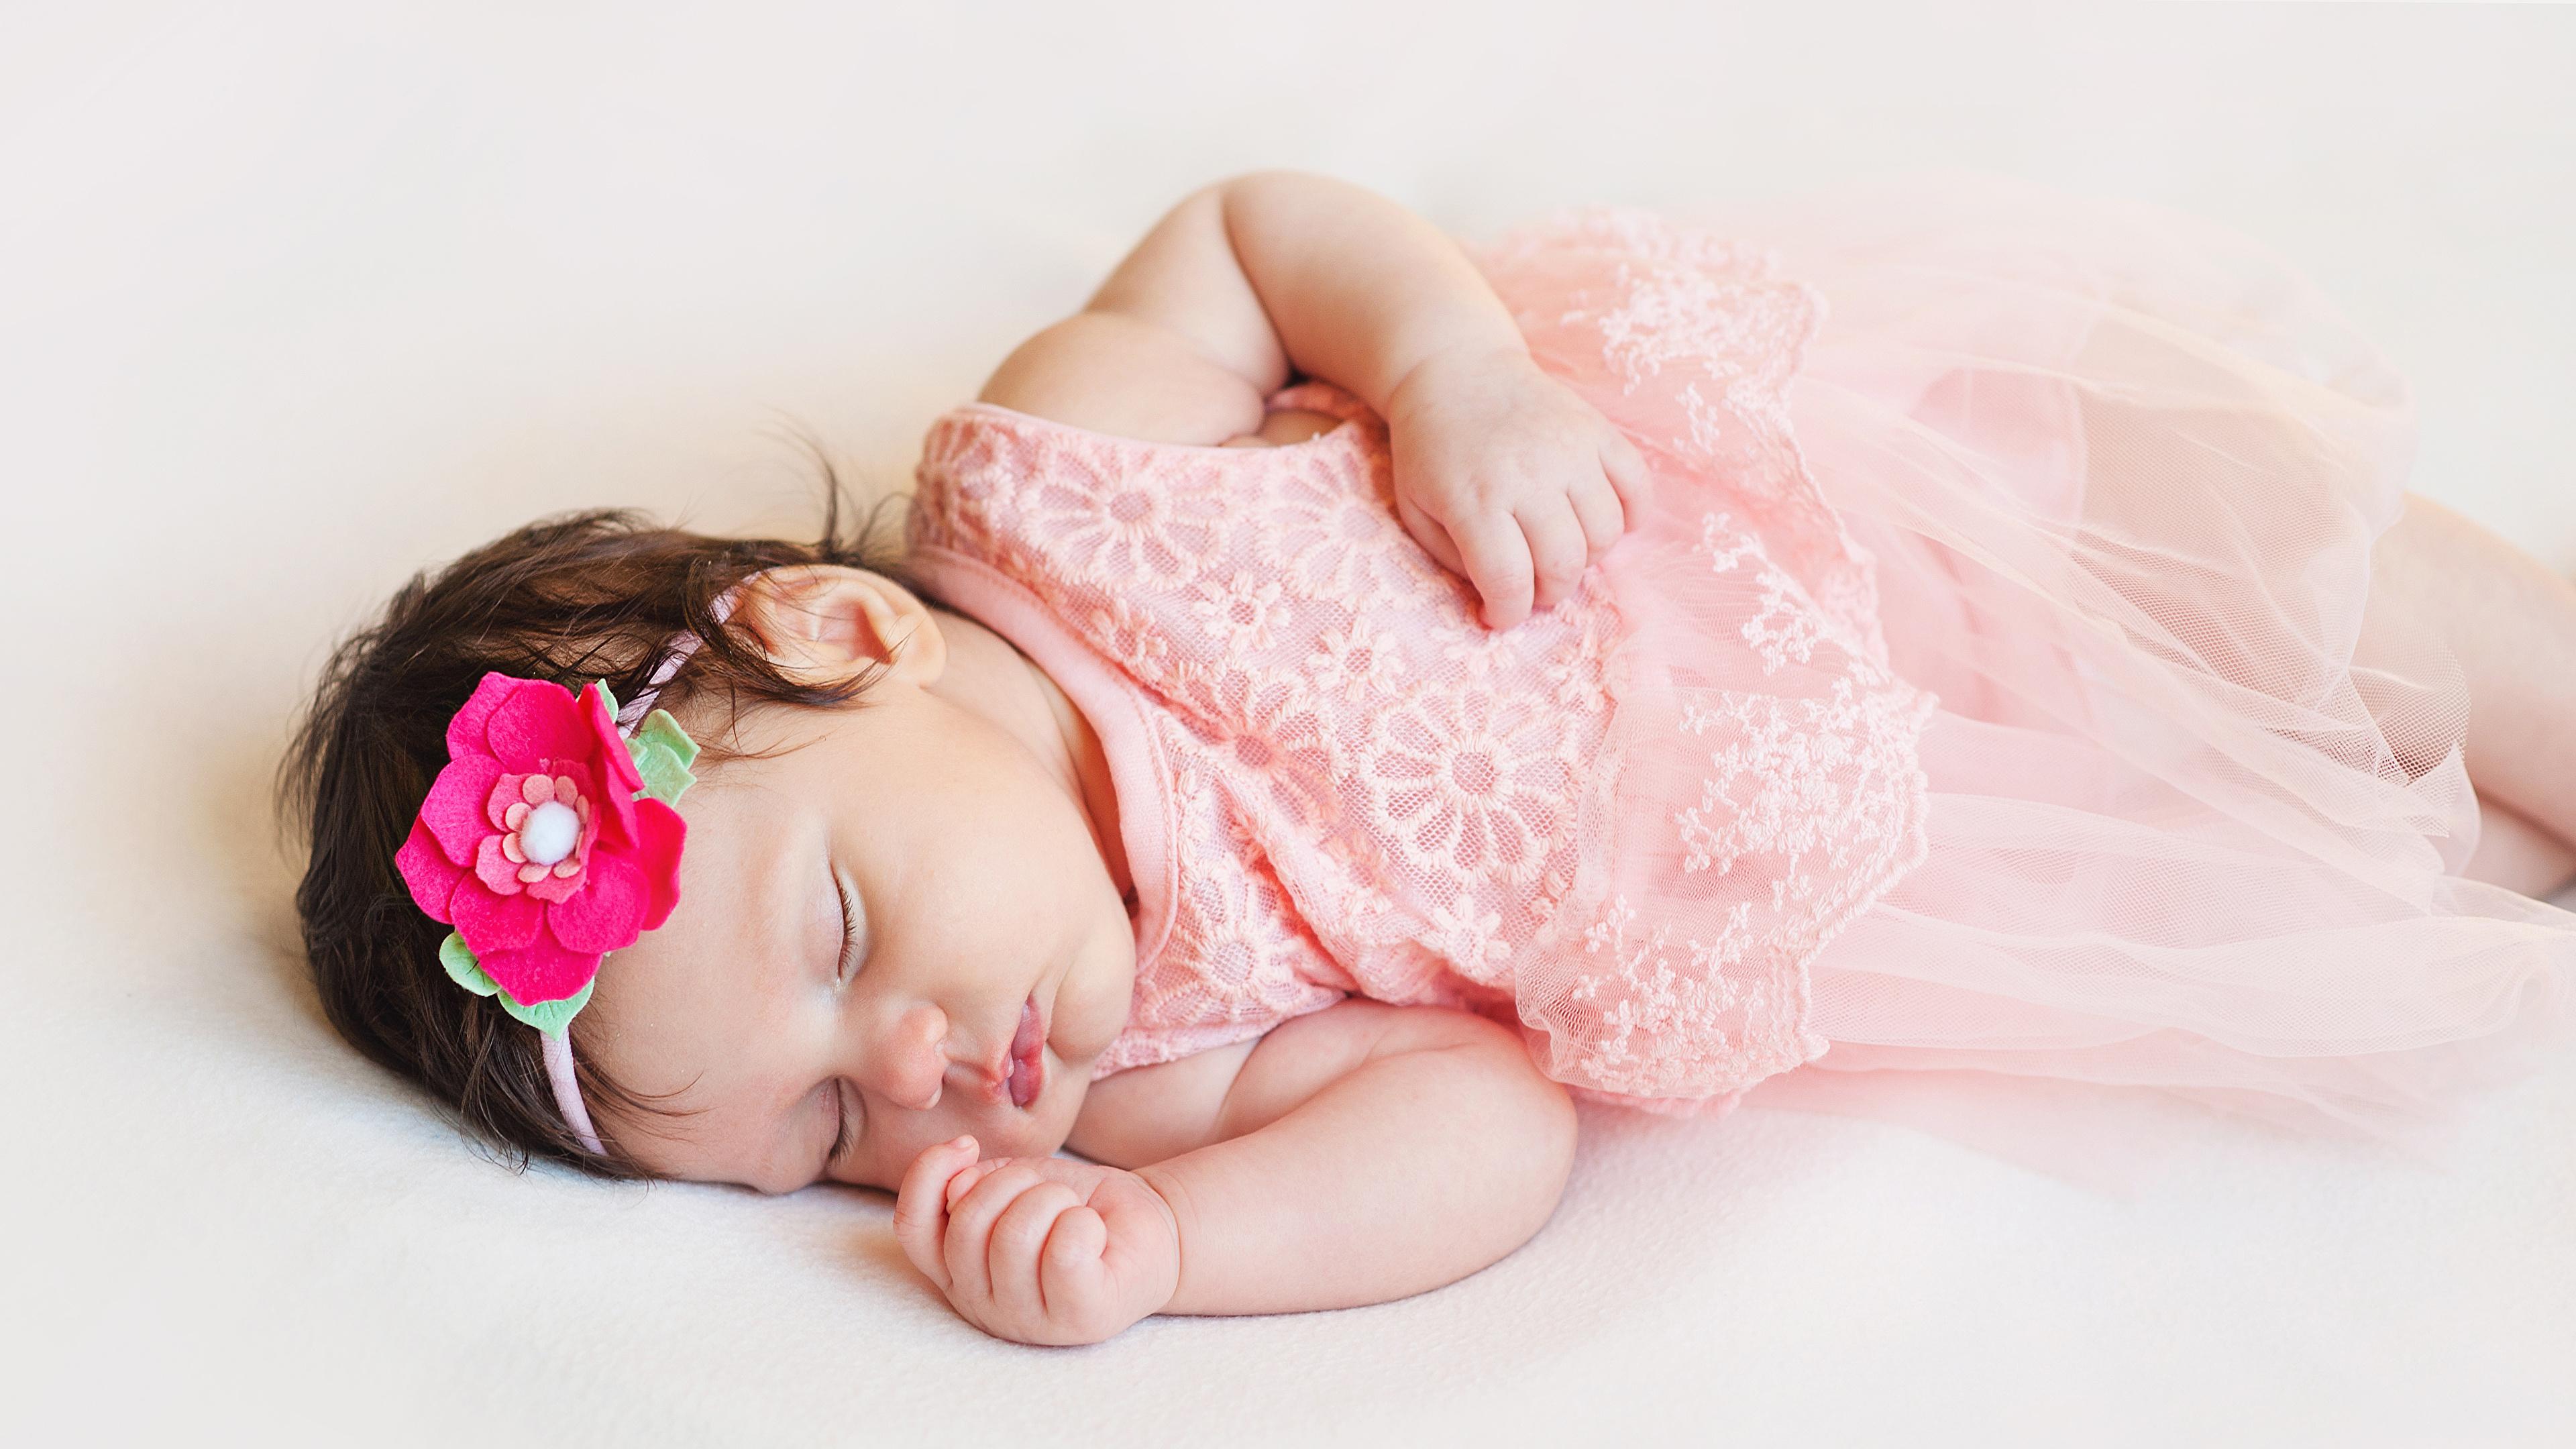 Фото младенец ребёнок Спит сером фоне 3840x2160 младенца Младенцы грудной ребёнок Дети сон спят спящий Серый фон